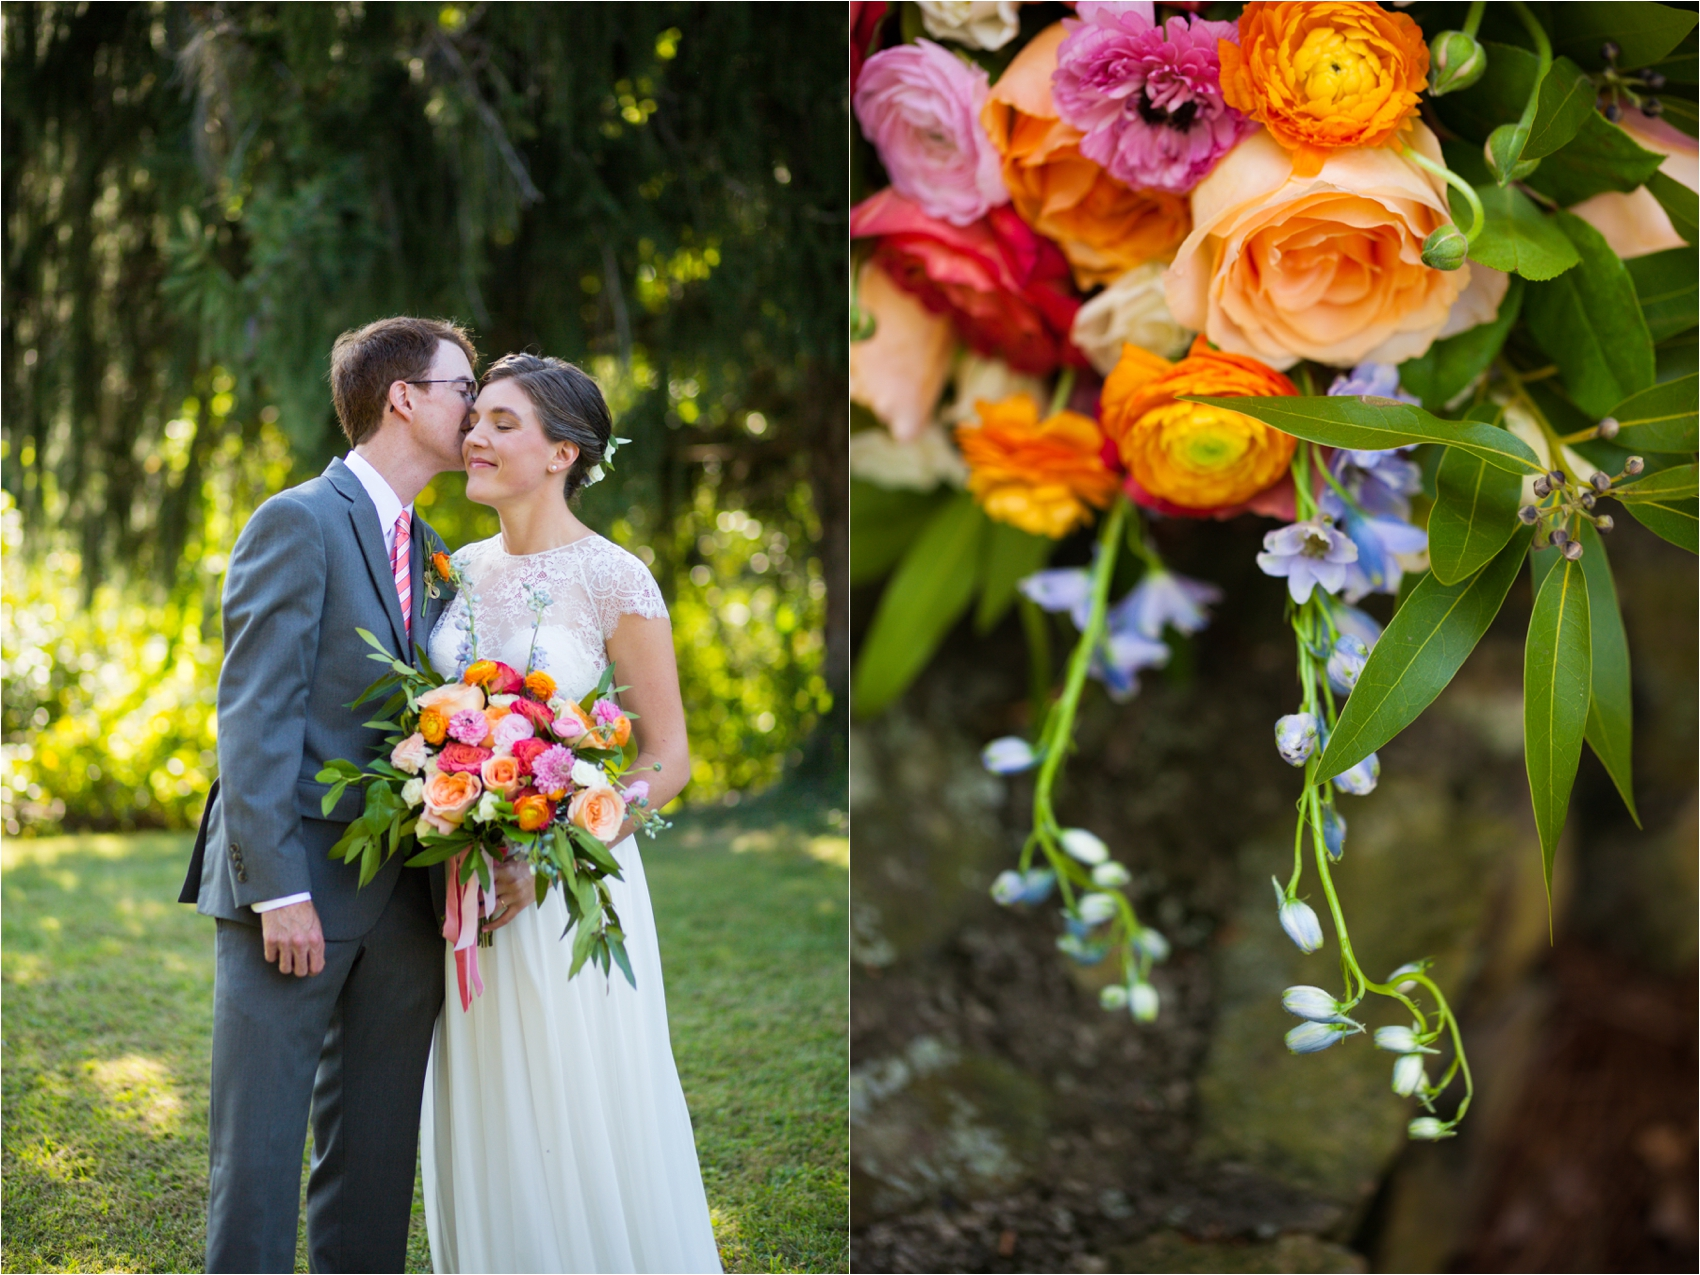 Feather-and-Oak-Rainforest-Trust-Virginia-Wedding-0590.jpg